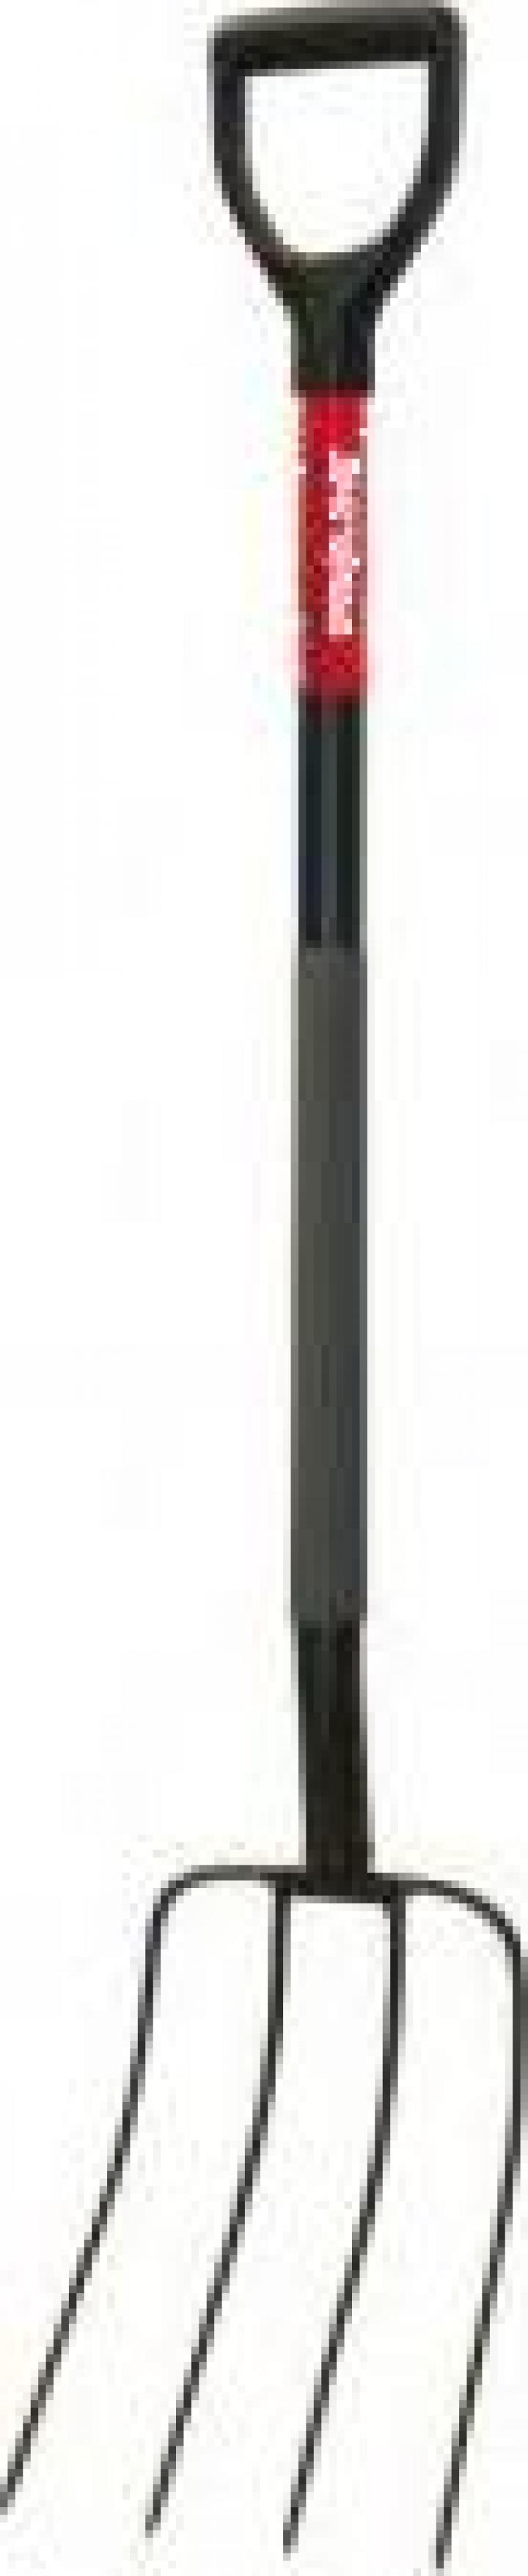 Furca gospodarie cu maner metal 230x310/1200mm